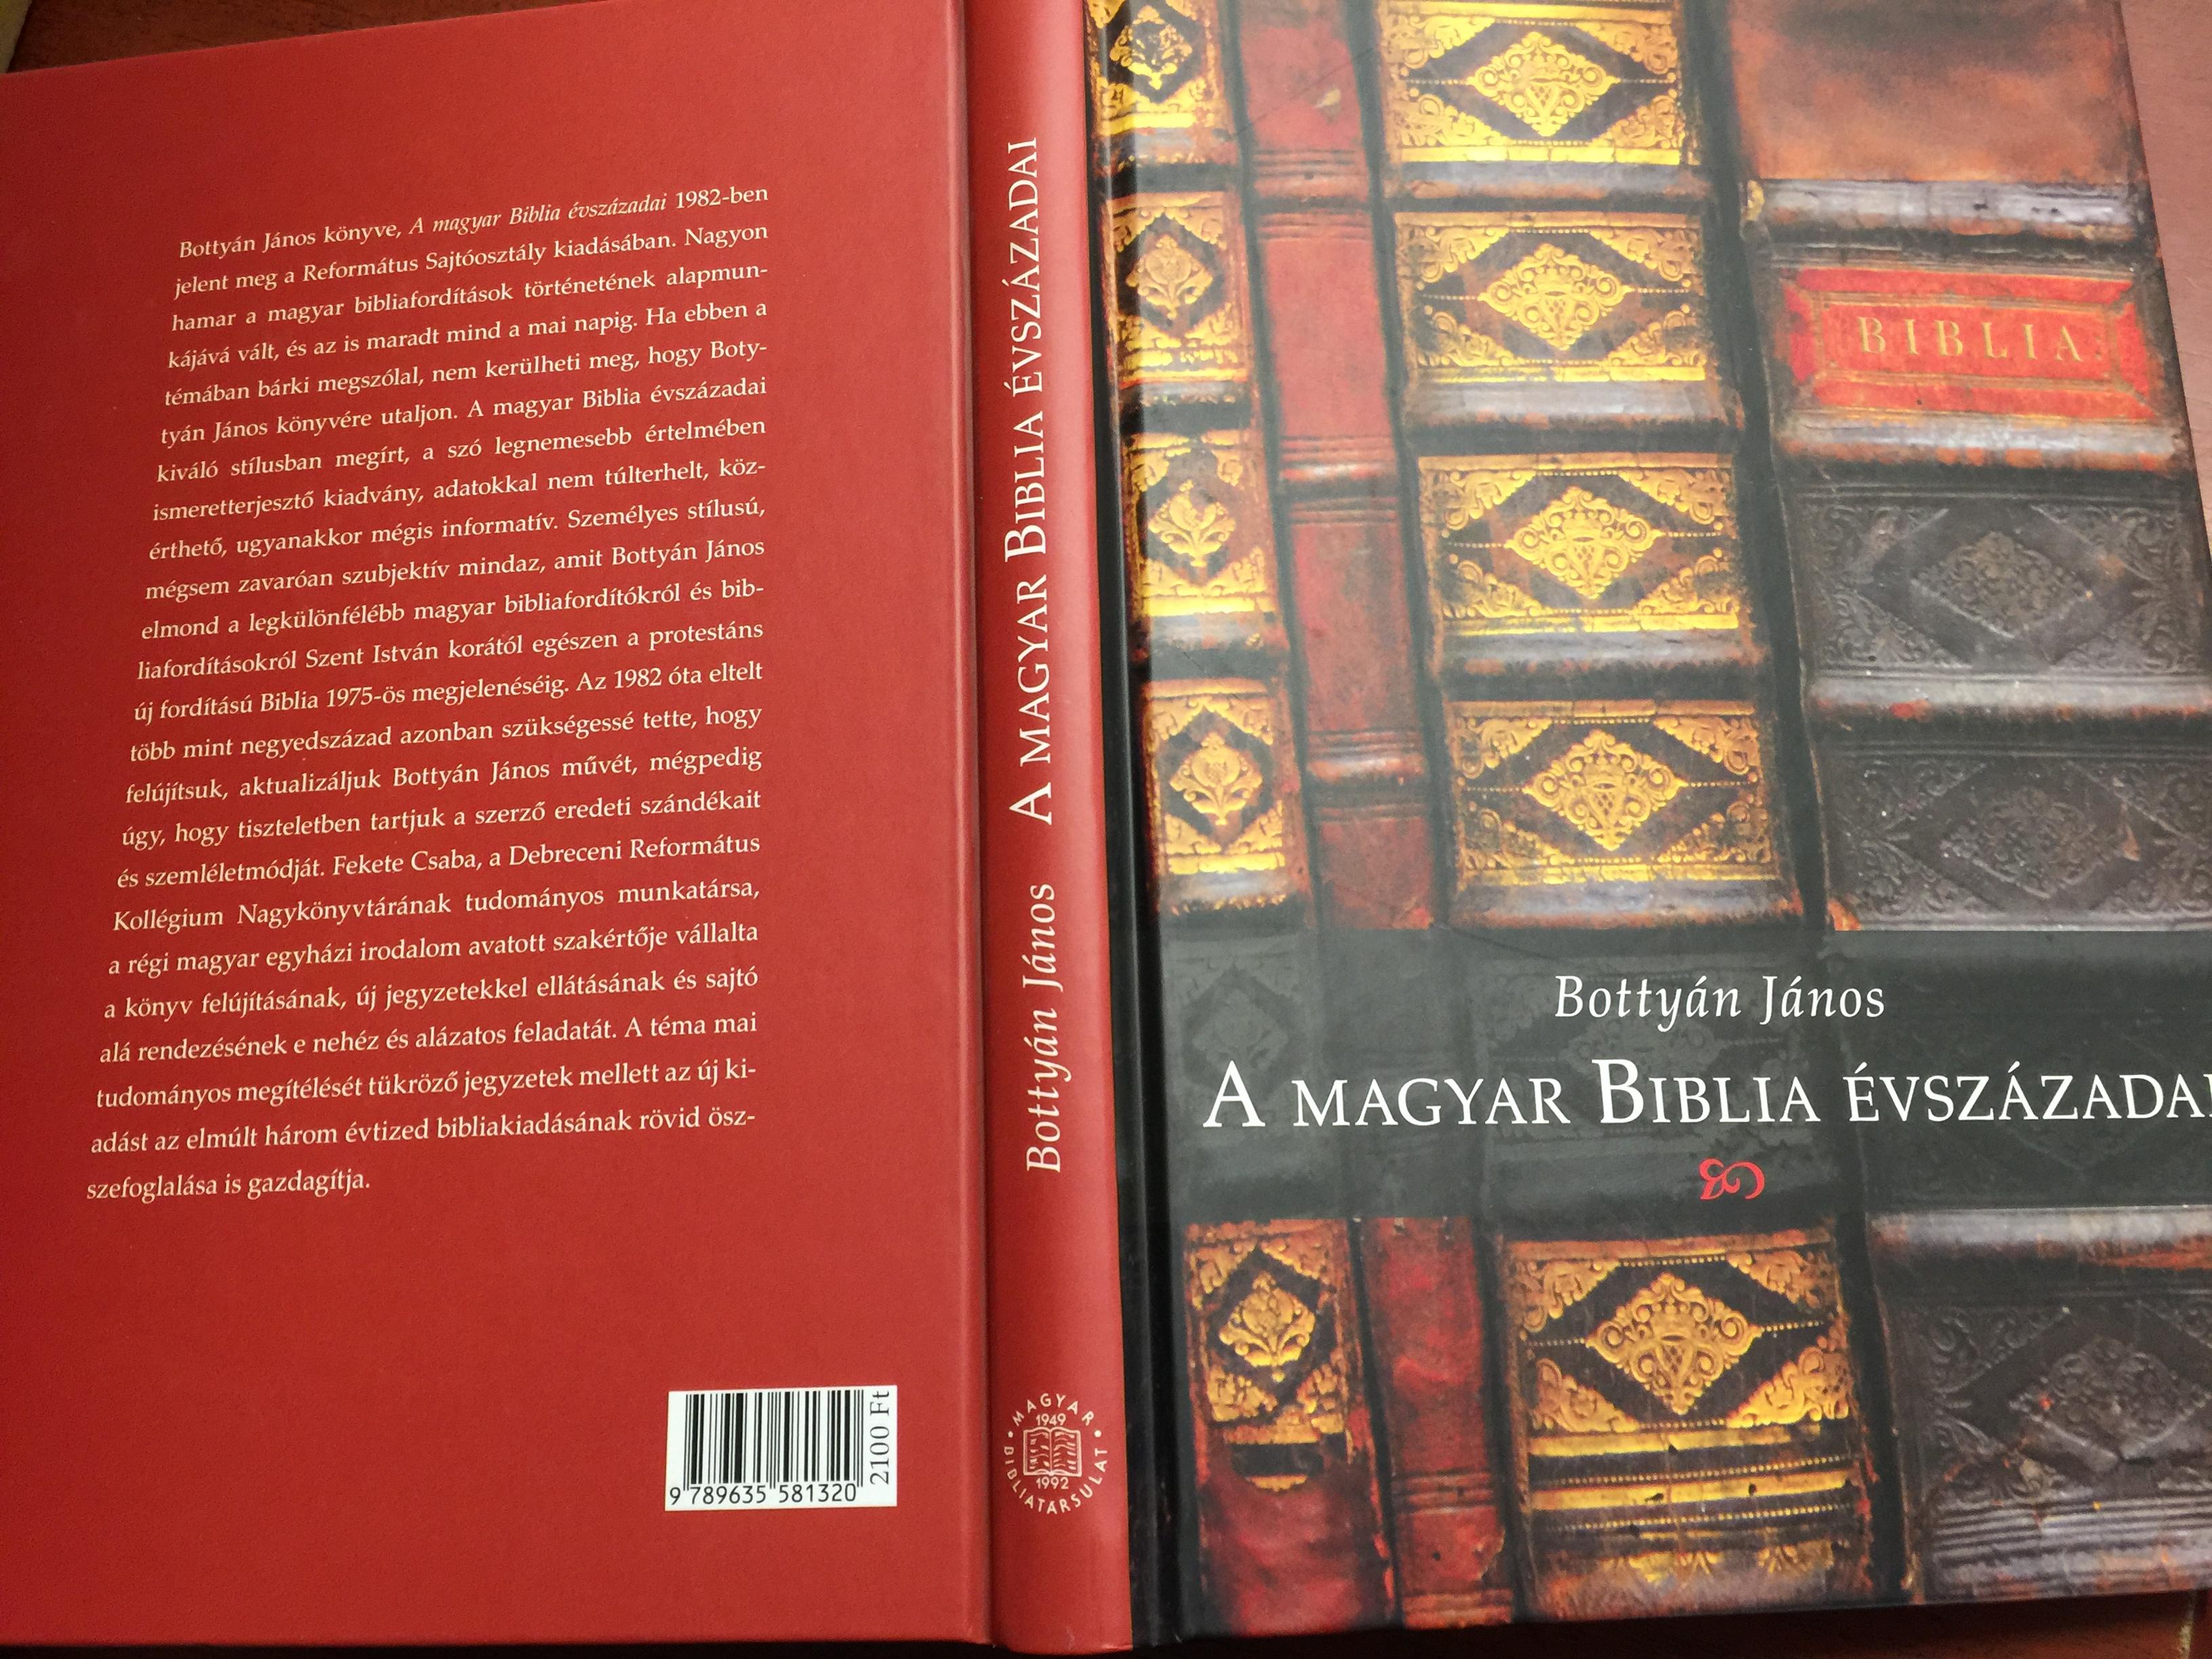 a-magyar-biblia-vsz-zadai-botty-n-j-nos-centuries-of-the-hungarian-bible-by-j-nos-botty-n-2nd-edition-hardcover-k-lvin-2009-11-.jpg